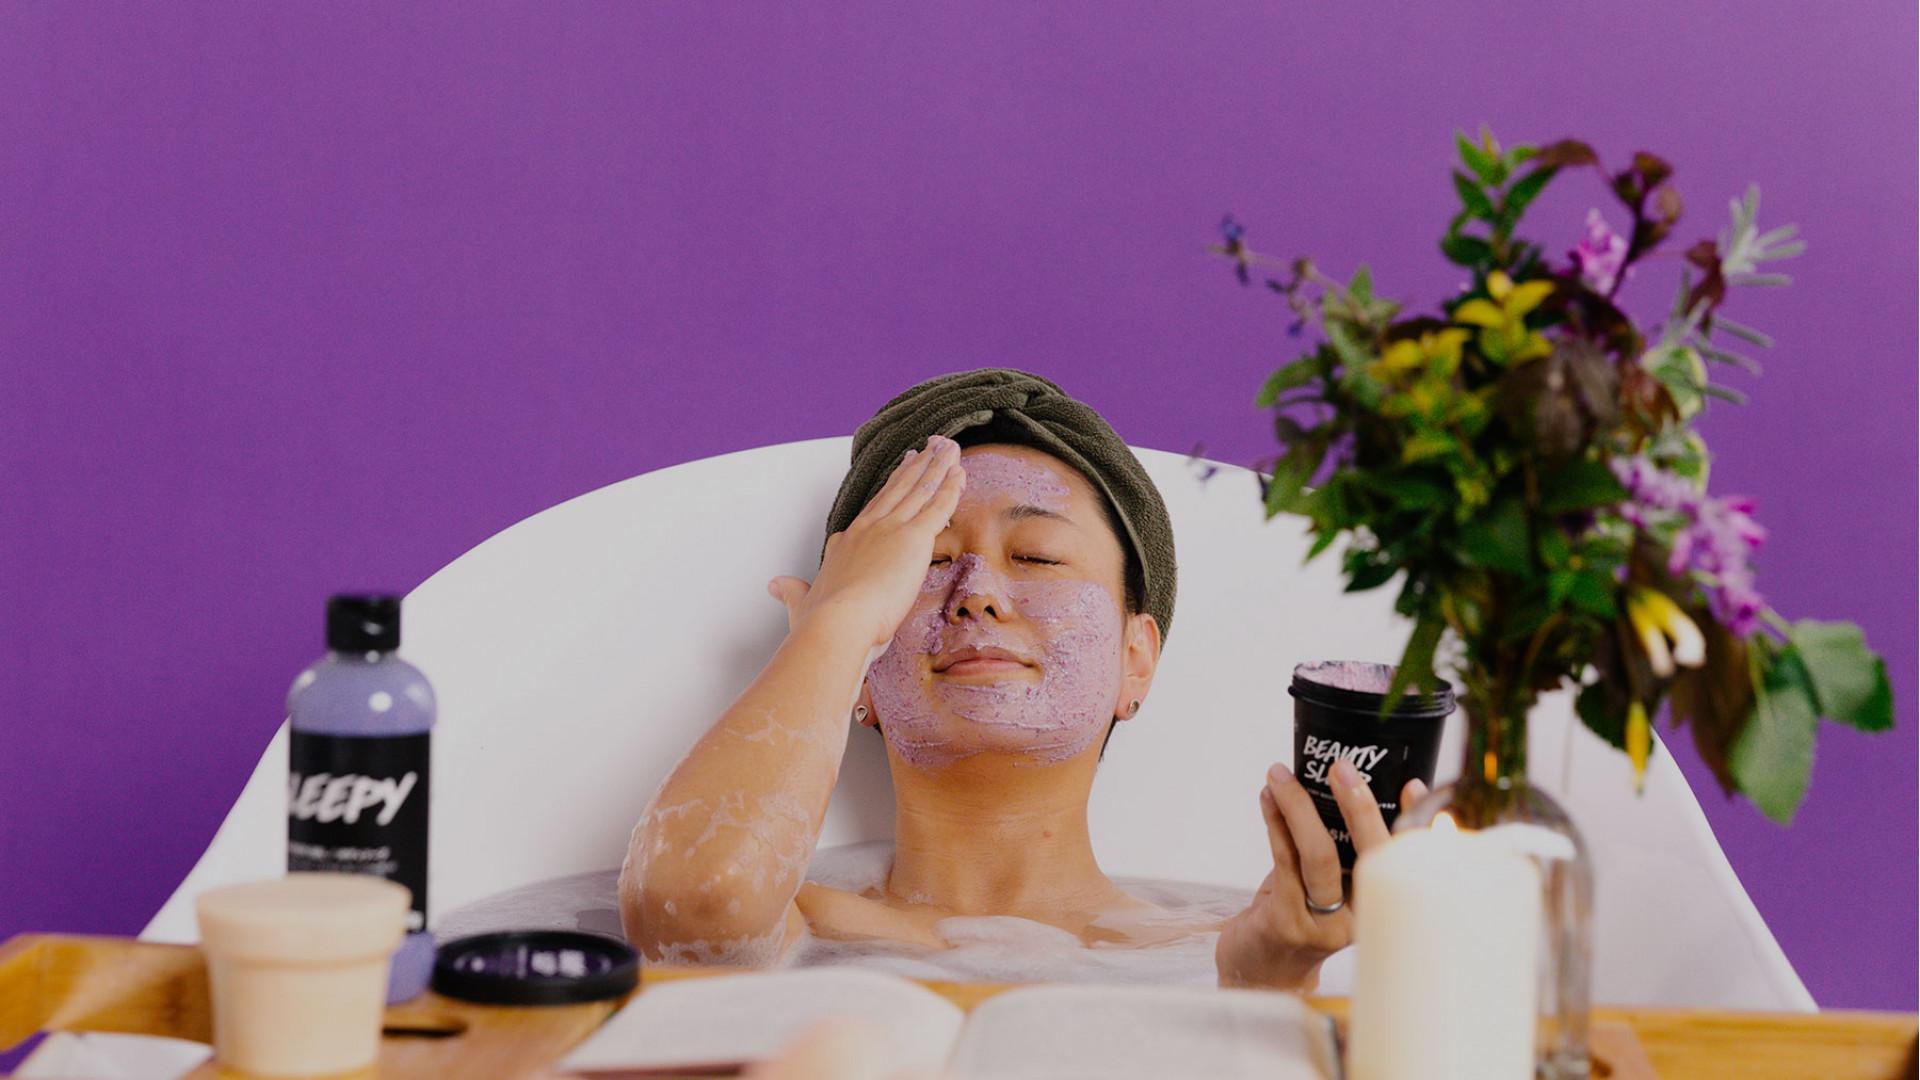 Beauty sleep маска за лице и тело